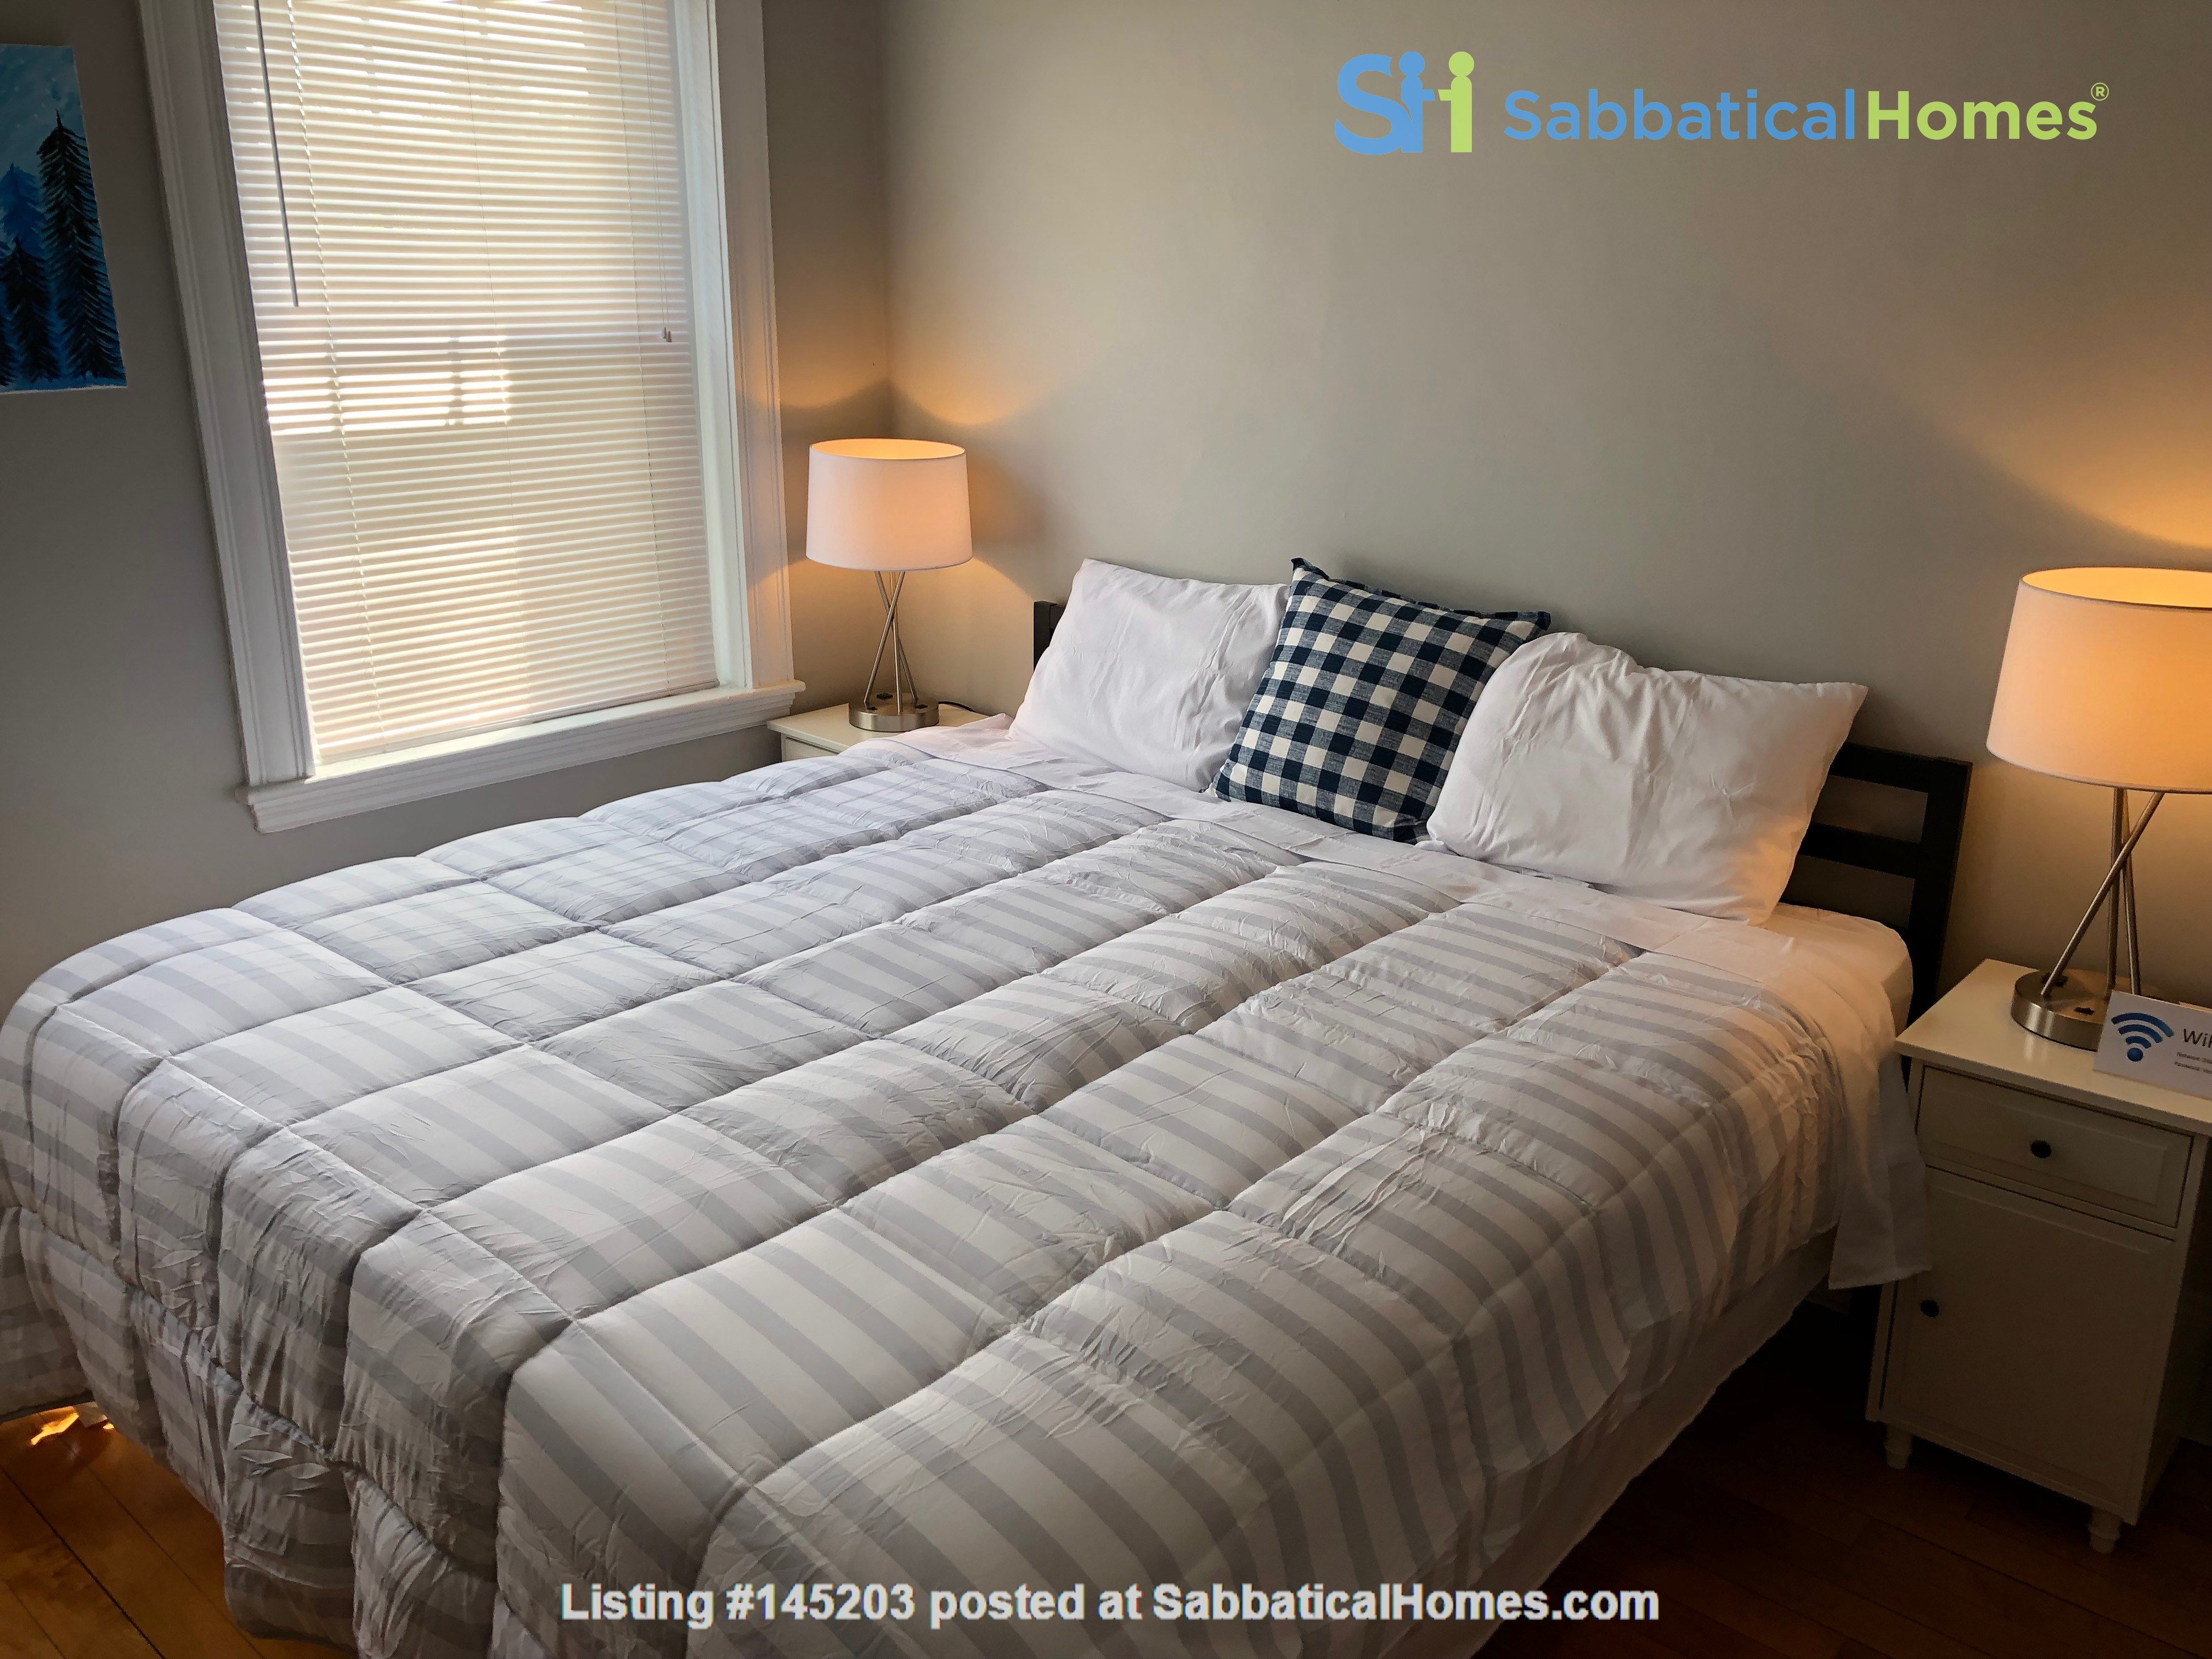 2bd/1ba Condo in Boston (Allston Neighborhood) near BU/BC/Harvard Home Rental in Boston, Massachusetts, United States 4